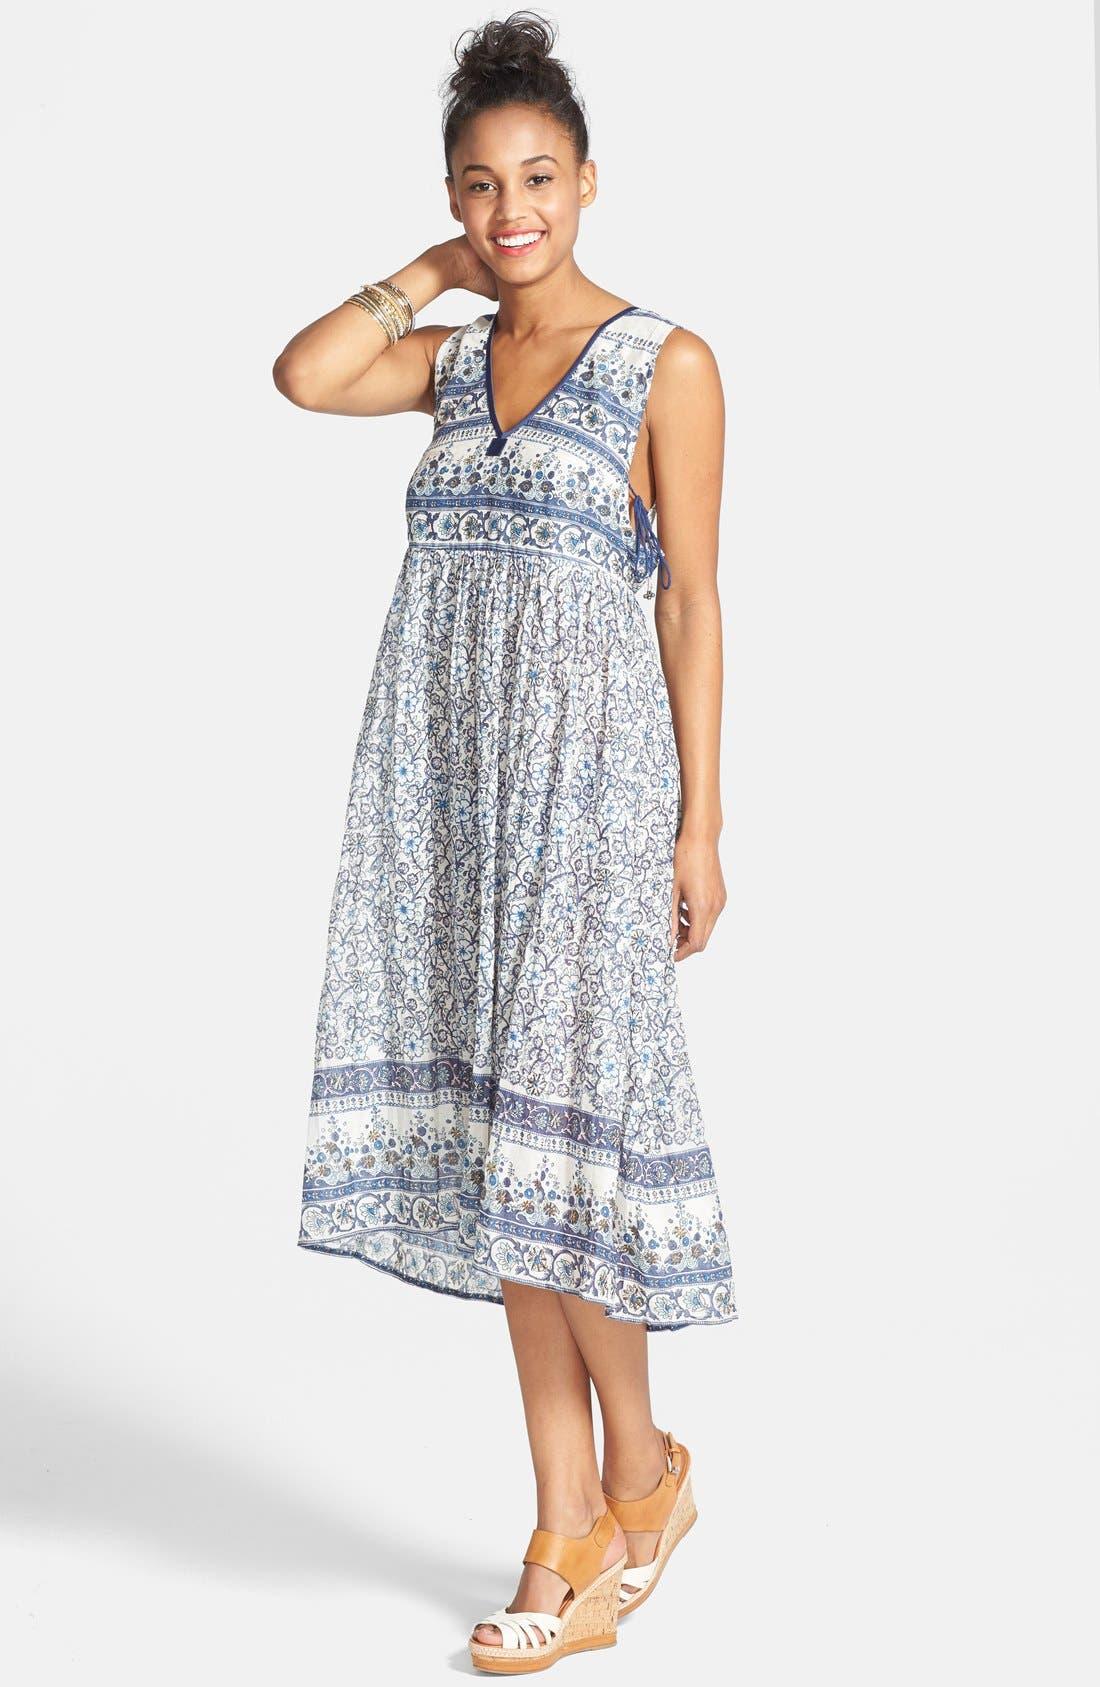 Alternate Image 1 Selected - Billabong 'I Heart This' Floral Print Midi Dress (Juniors)